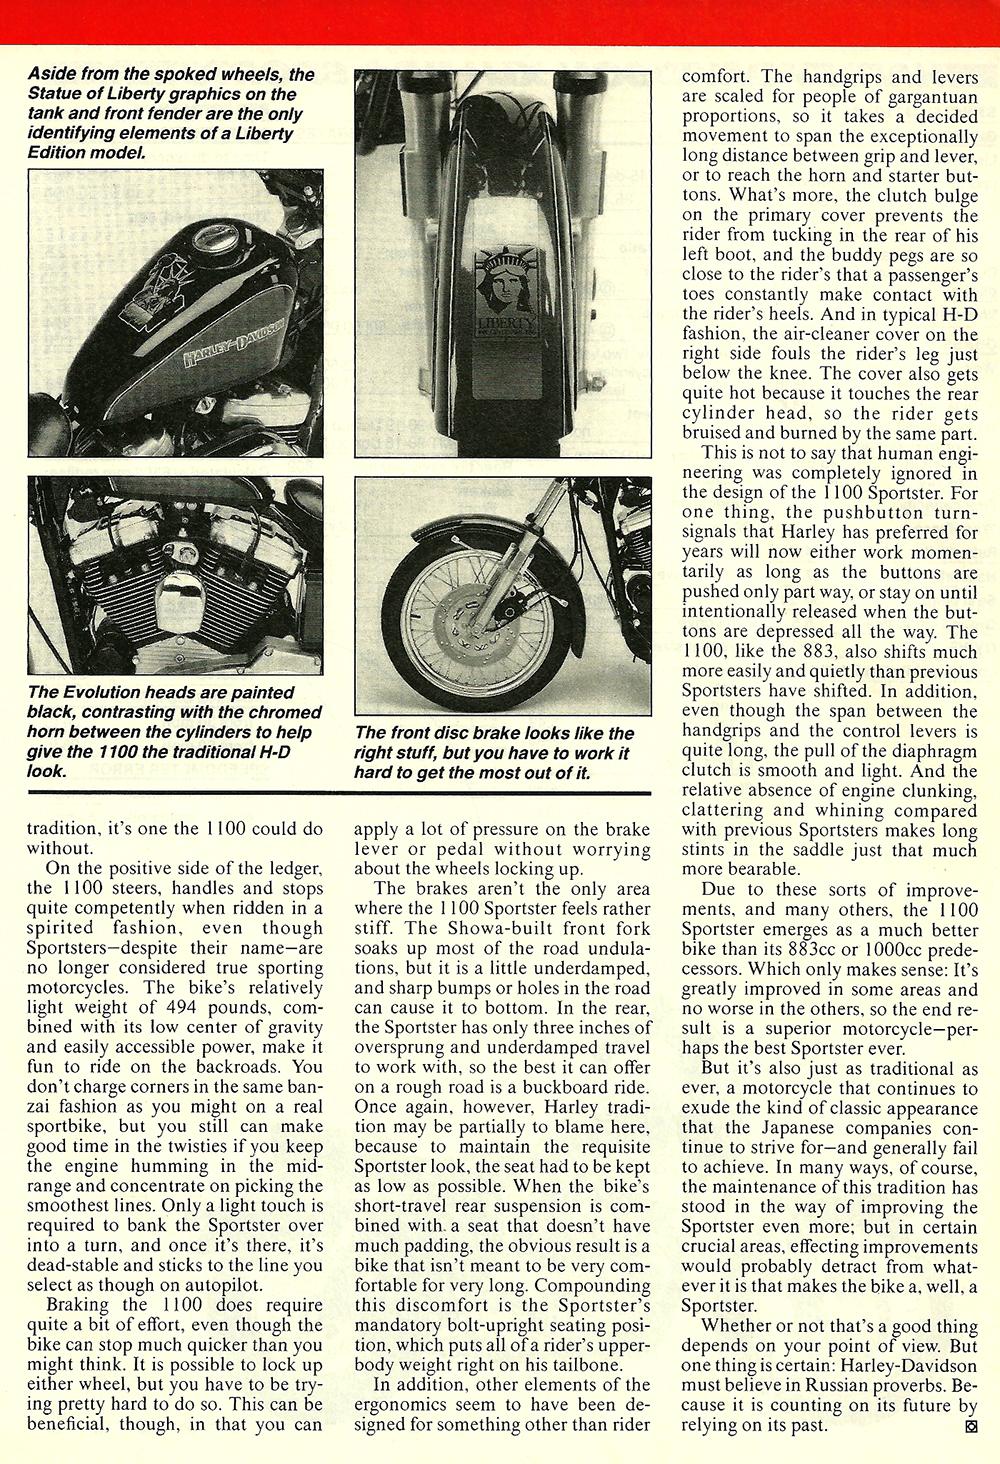 1985 Harley Davidson XLH 1100 Sportster road test 04.jpg